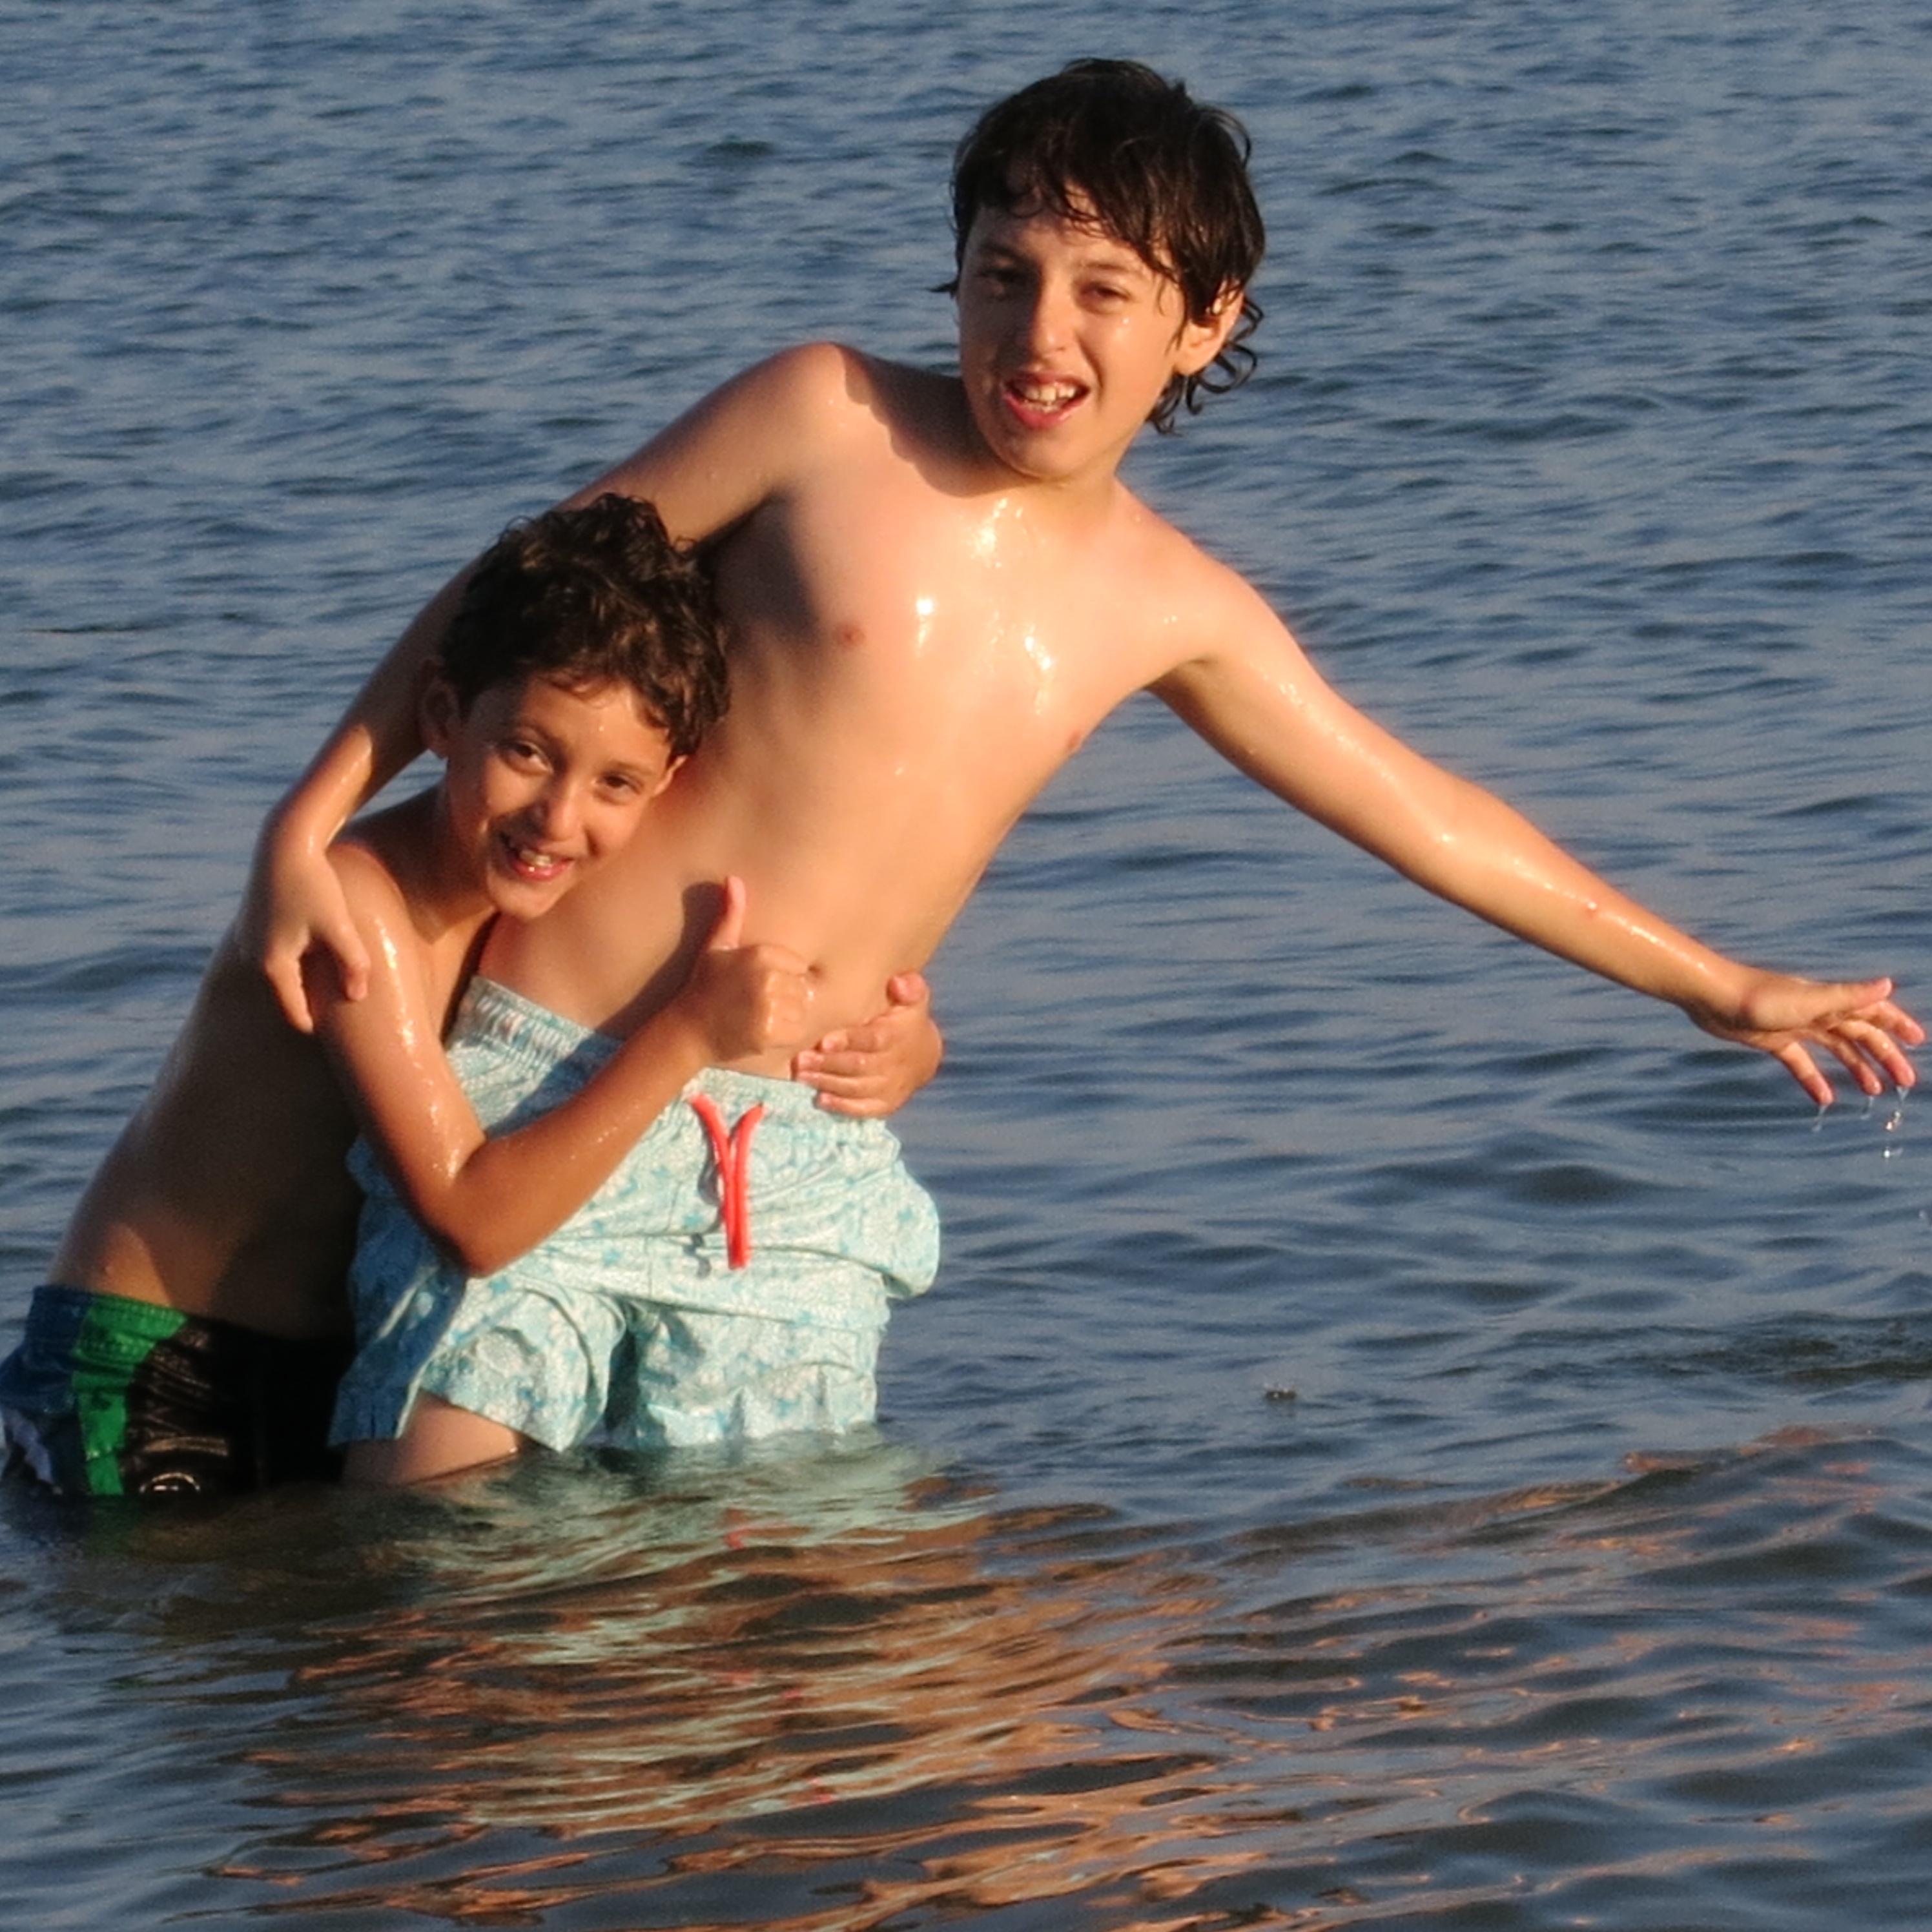 imgsrc beach tumblr - photo #5